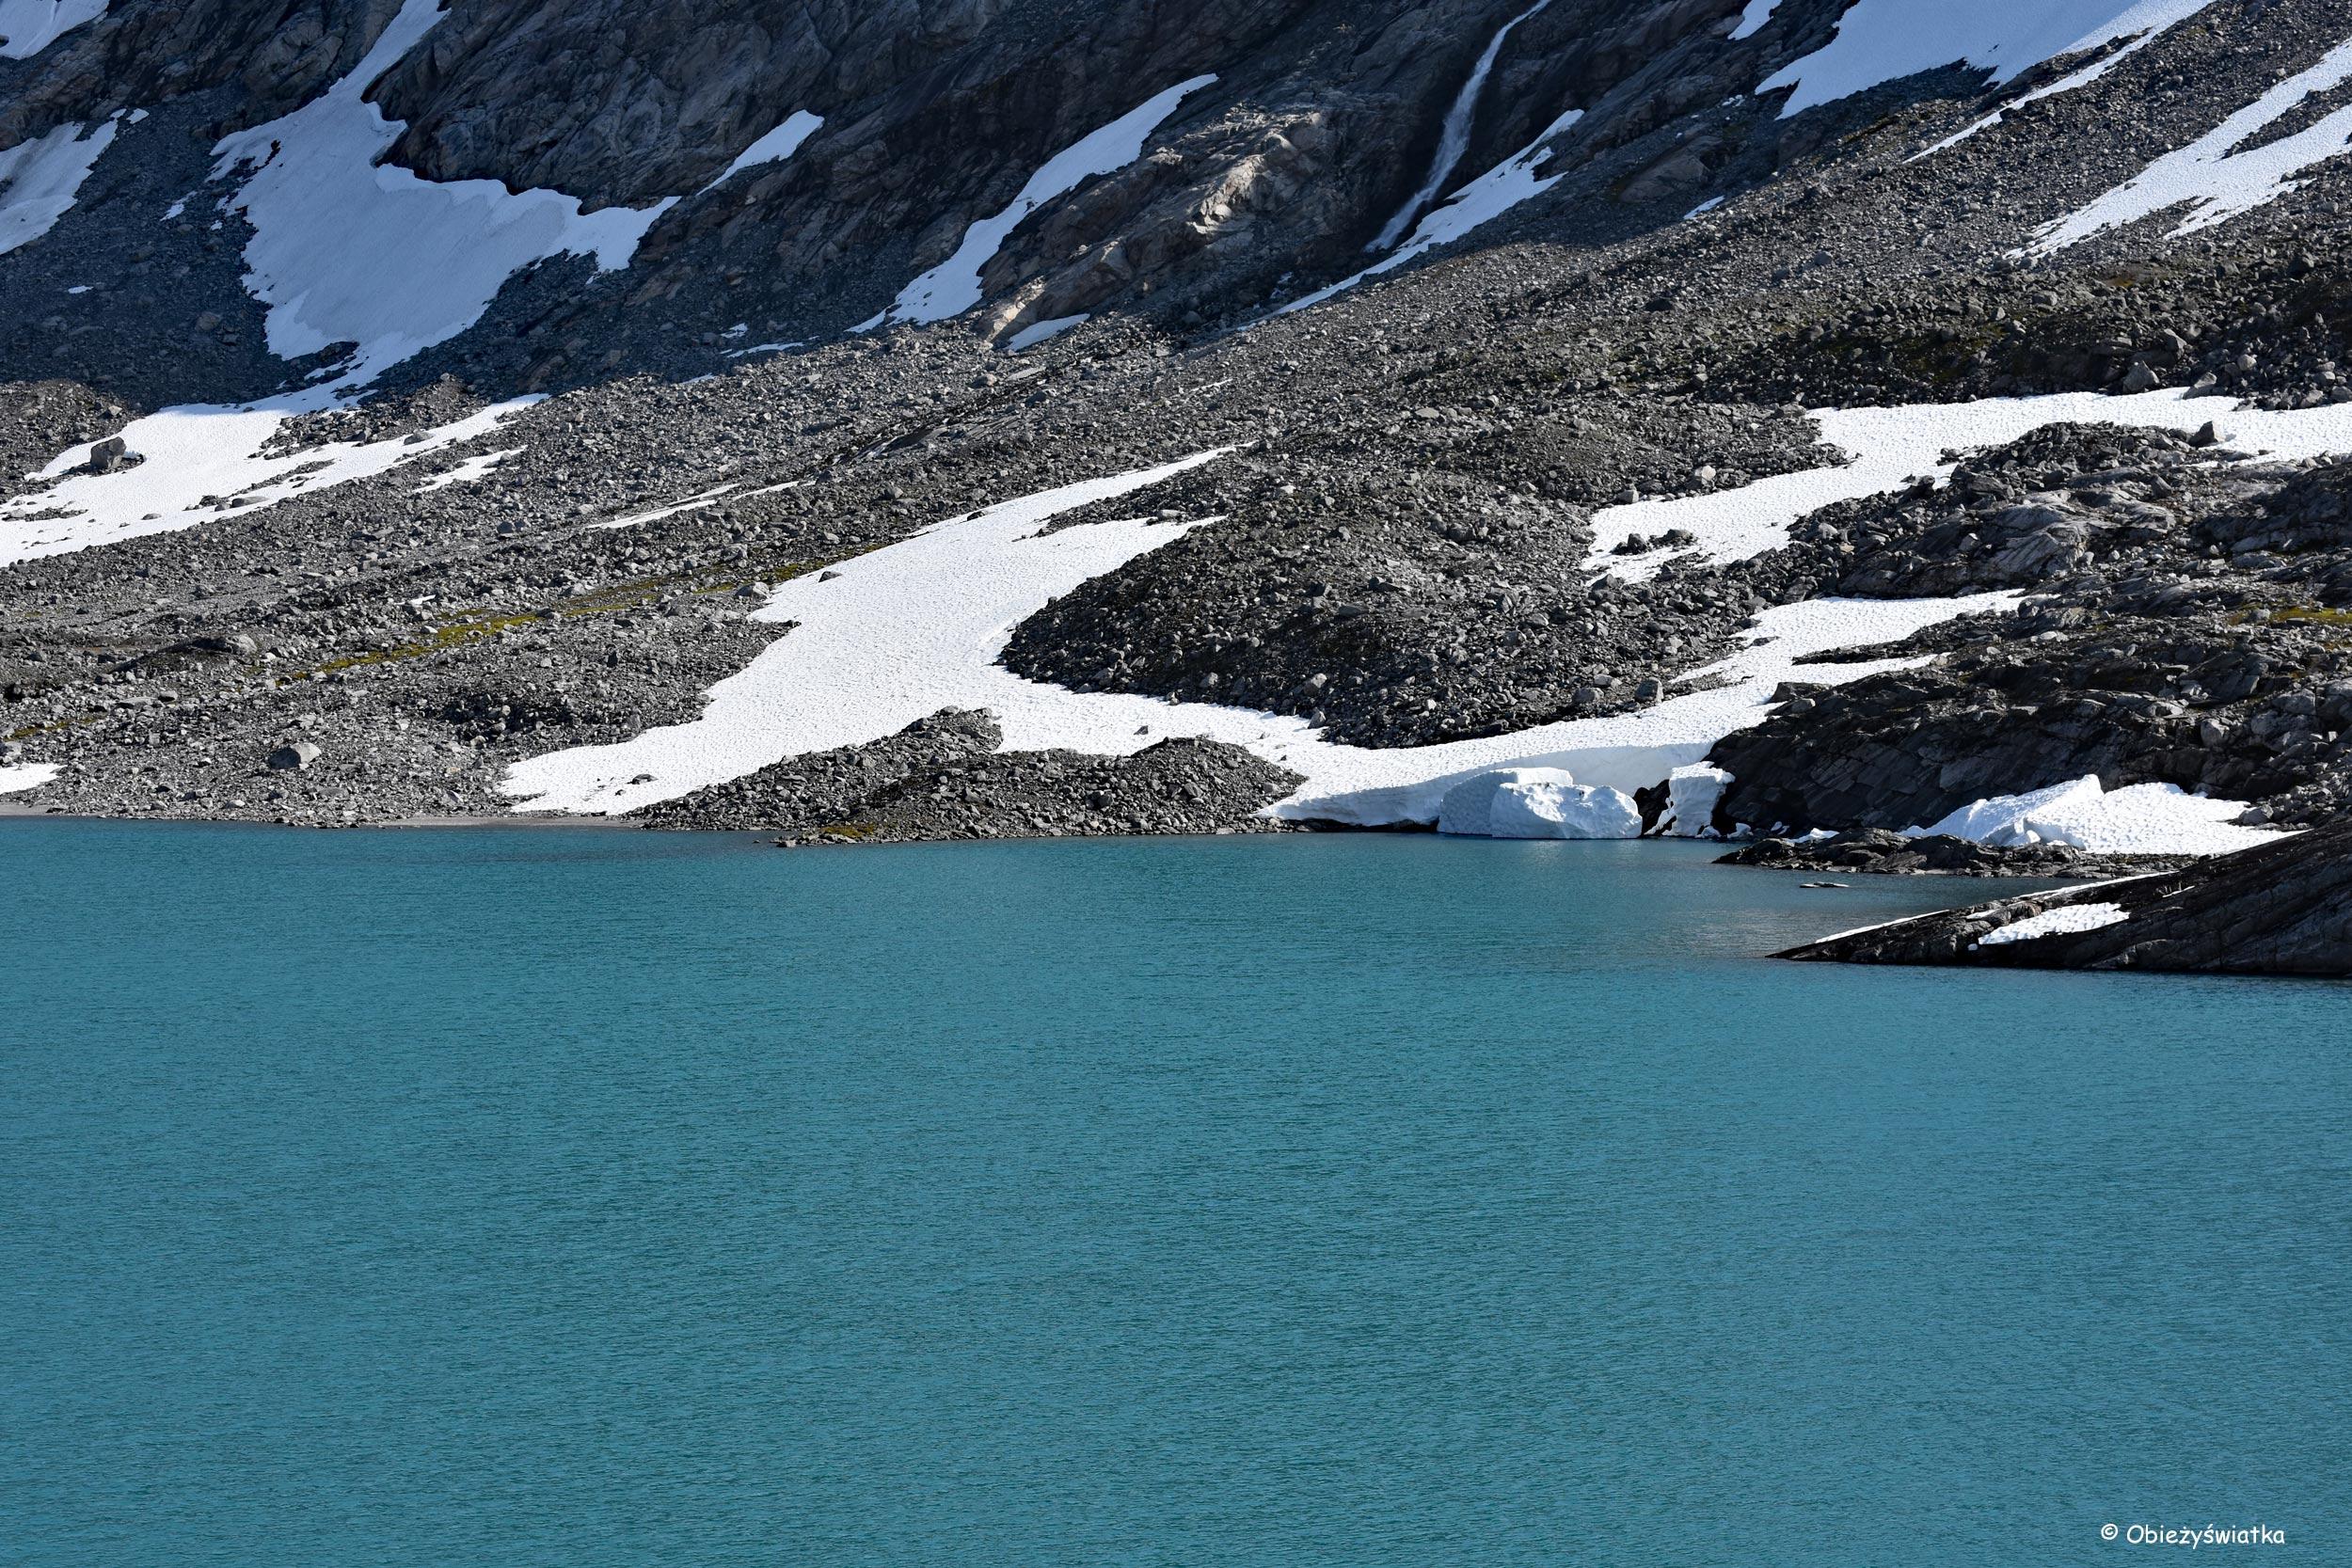 Śnieg, błękit wody - Gamle Strynefjellsvegen, Norwegia